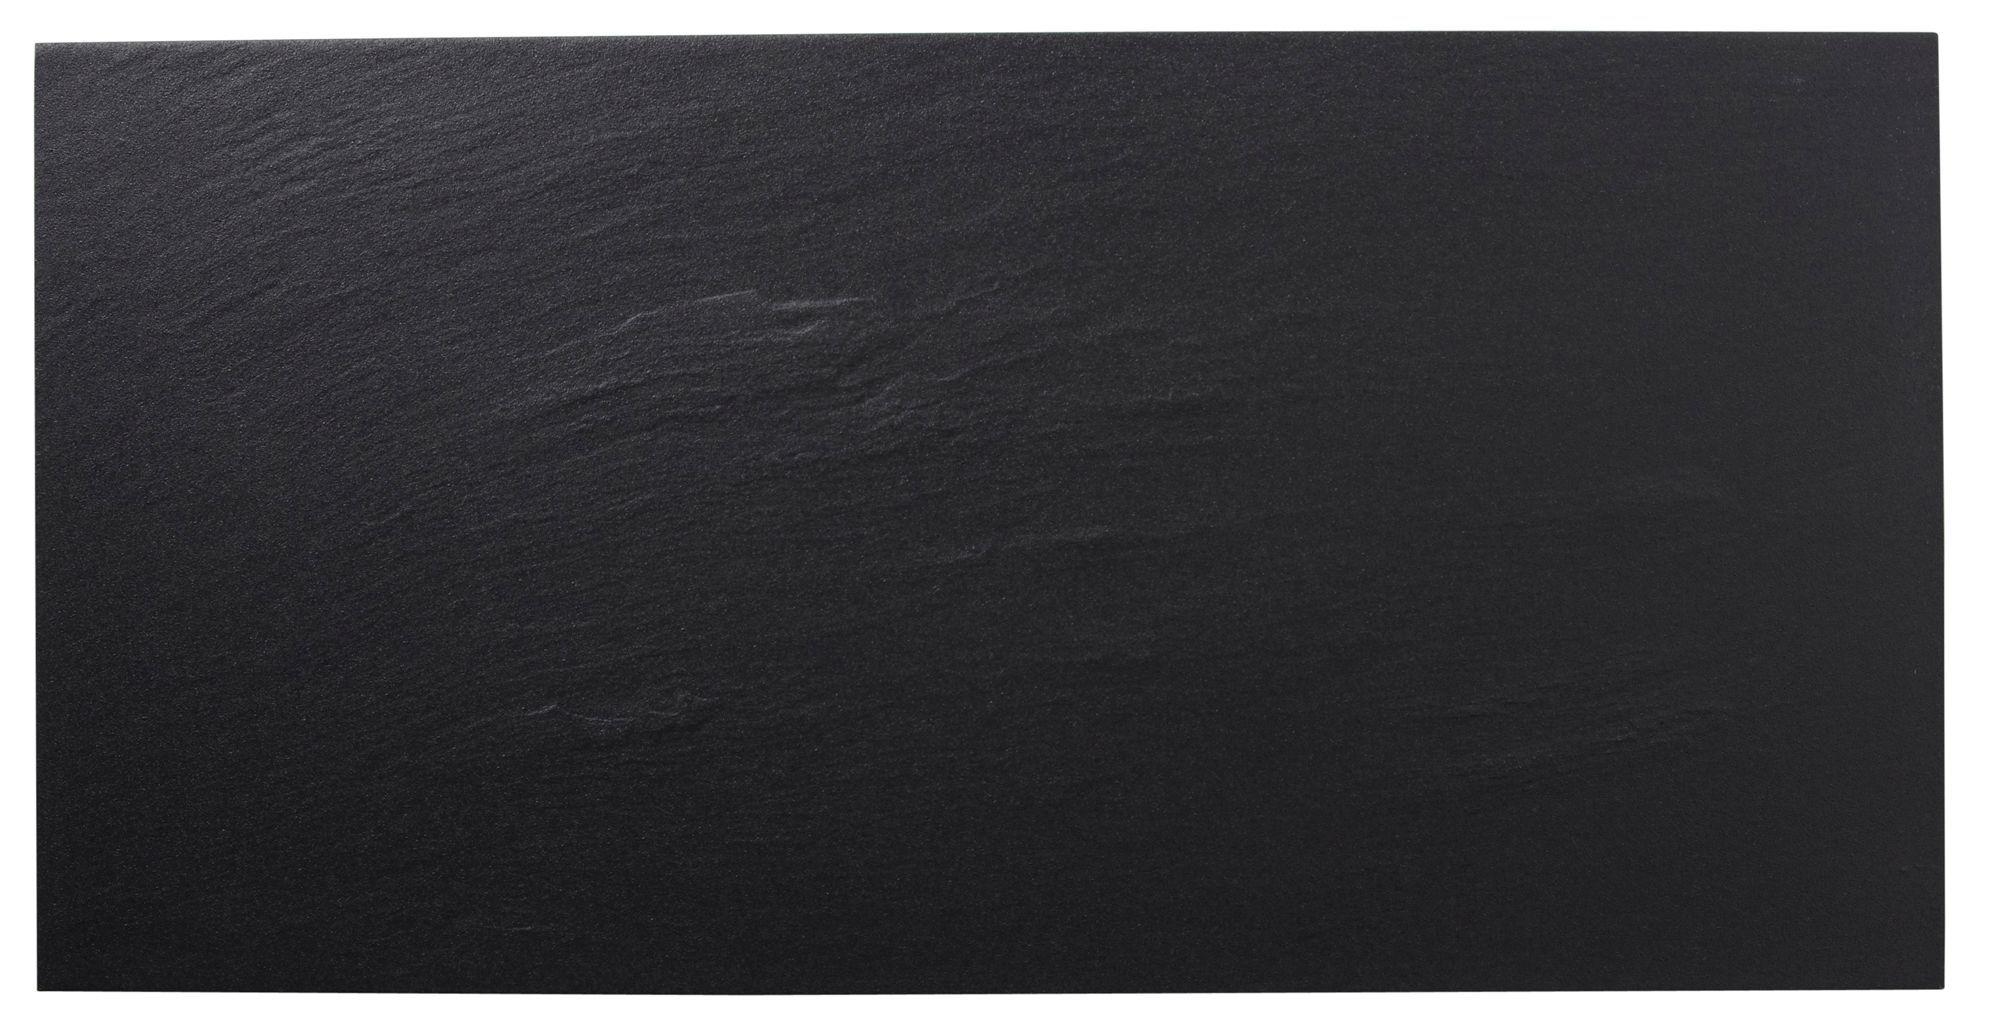 Slate Effect Black Stone Effect Porcelain Wall & Floor Tile, Pack Of 6, (l)300mm (w)600mm